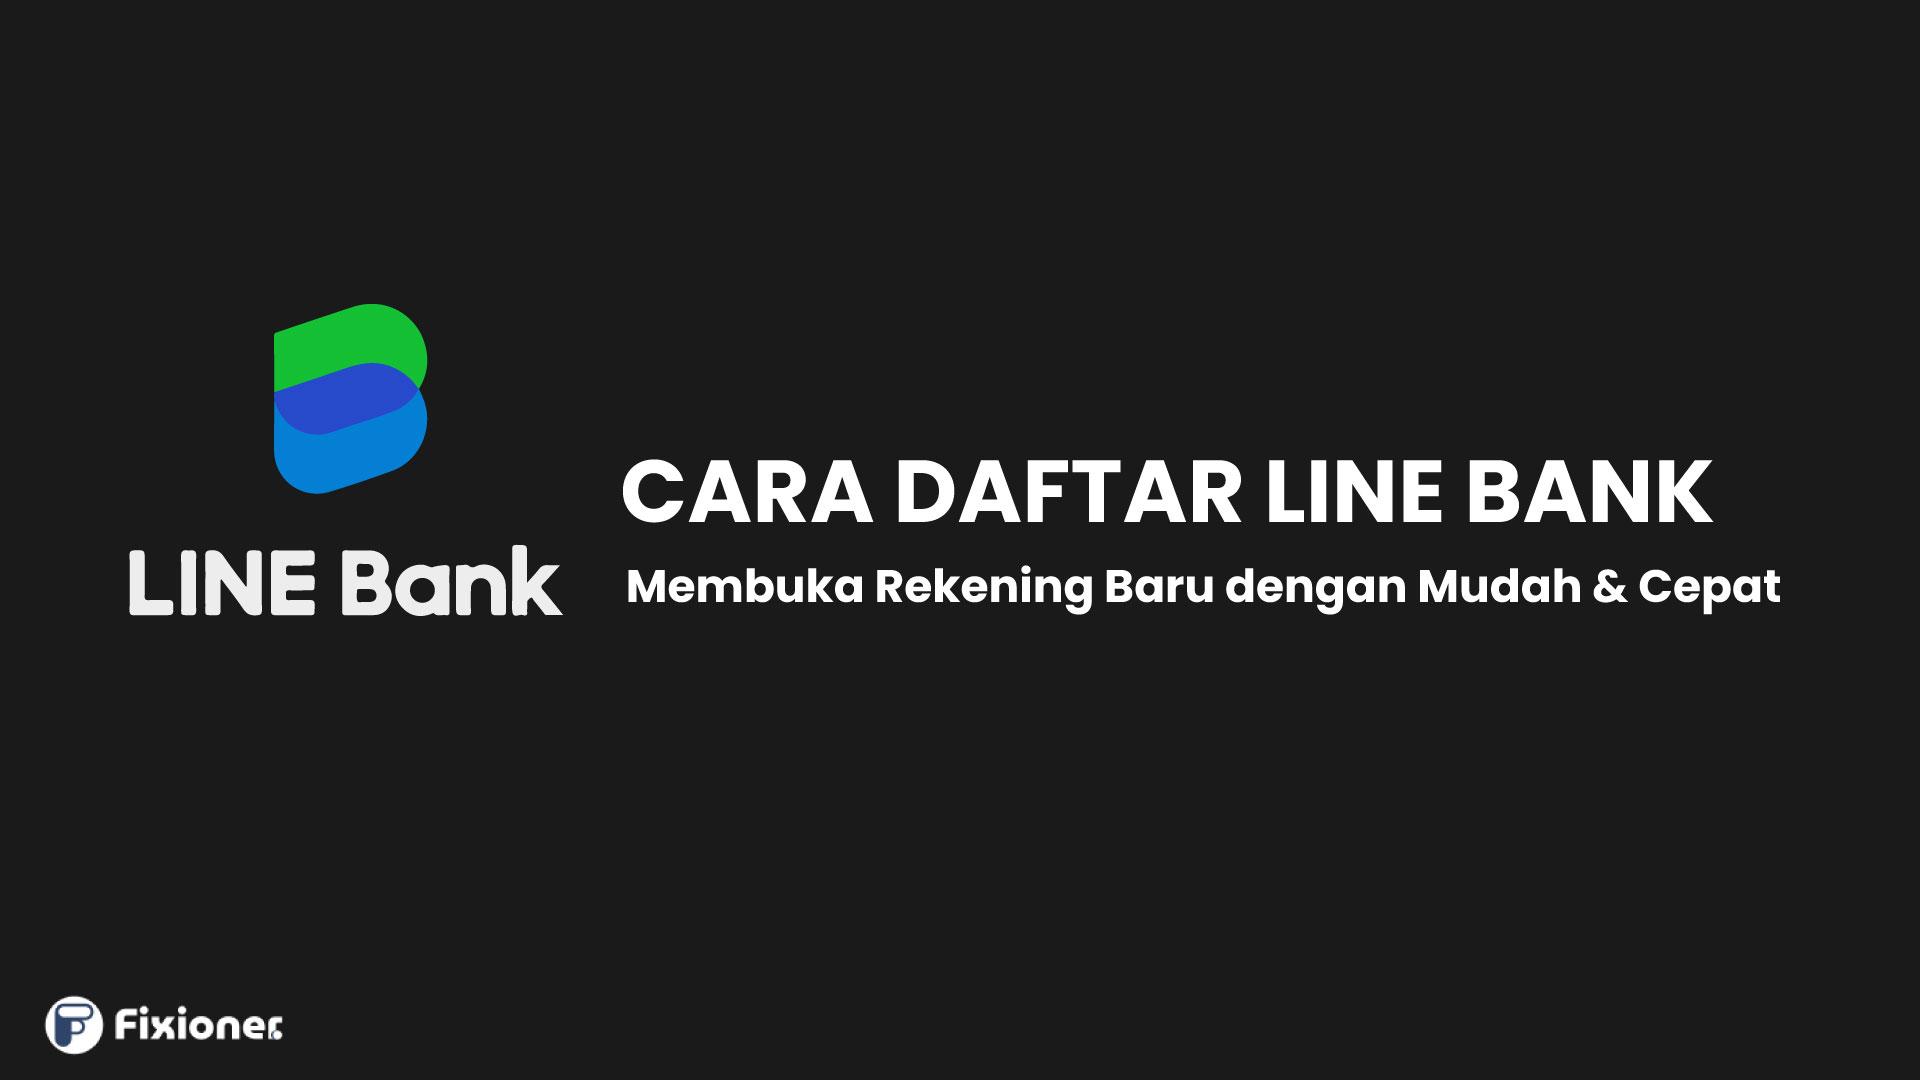 Daftar LINE Bank